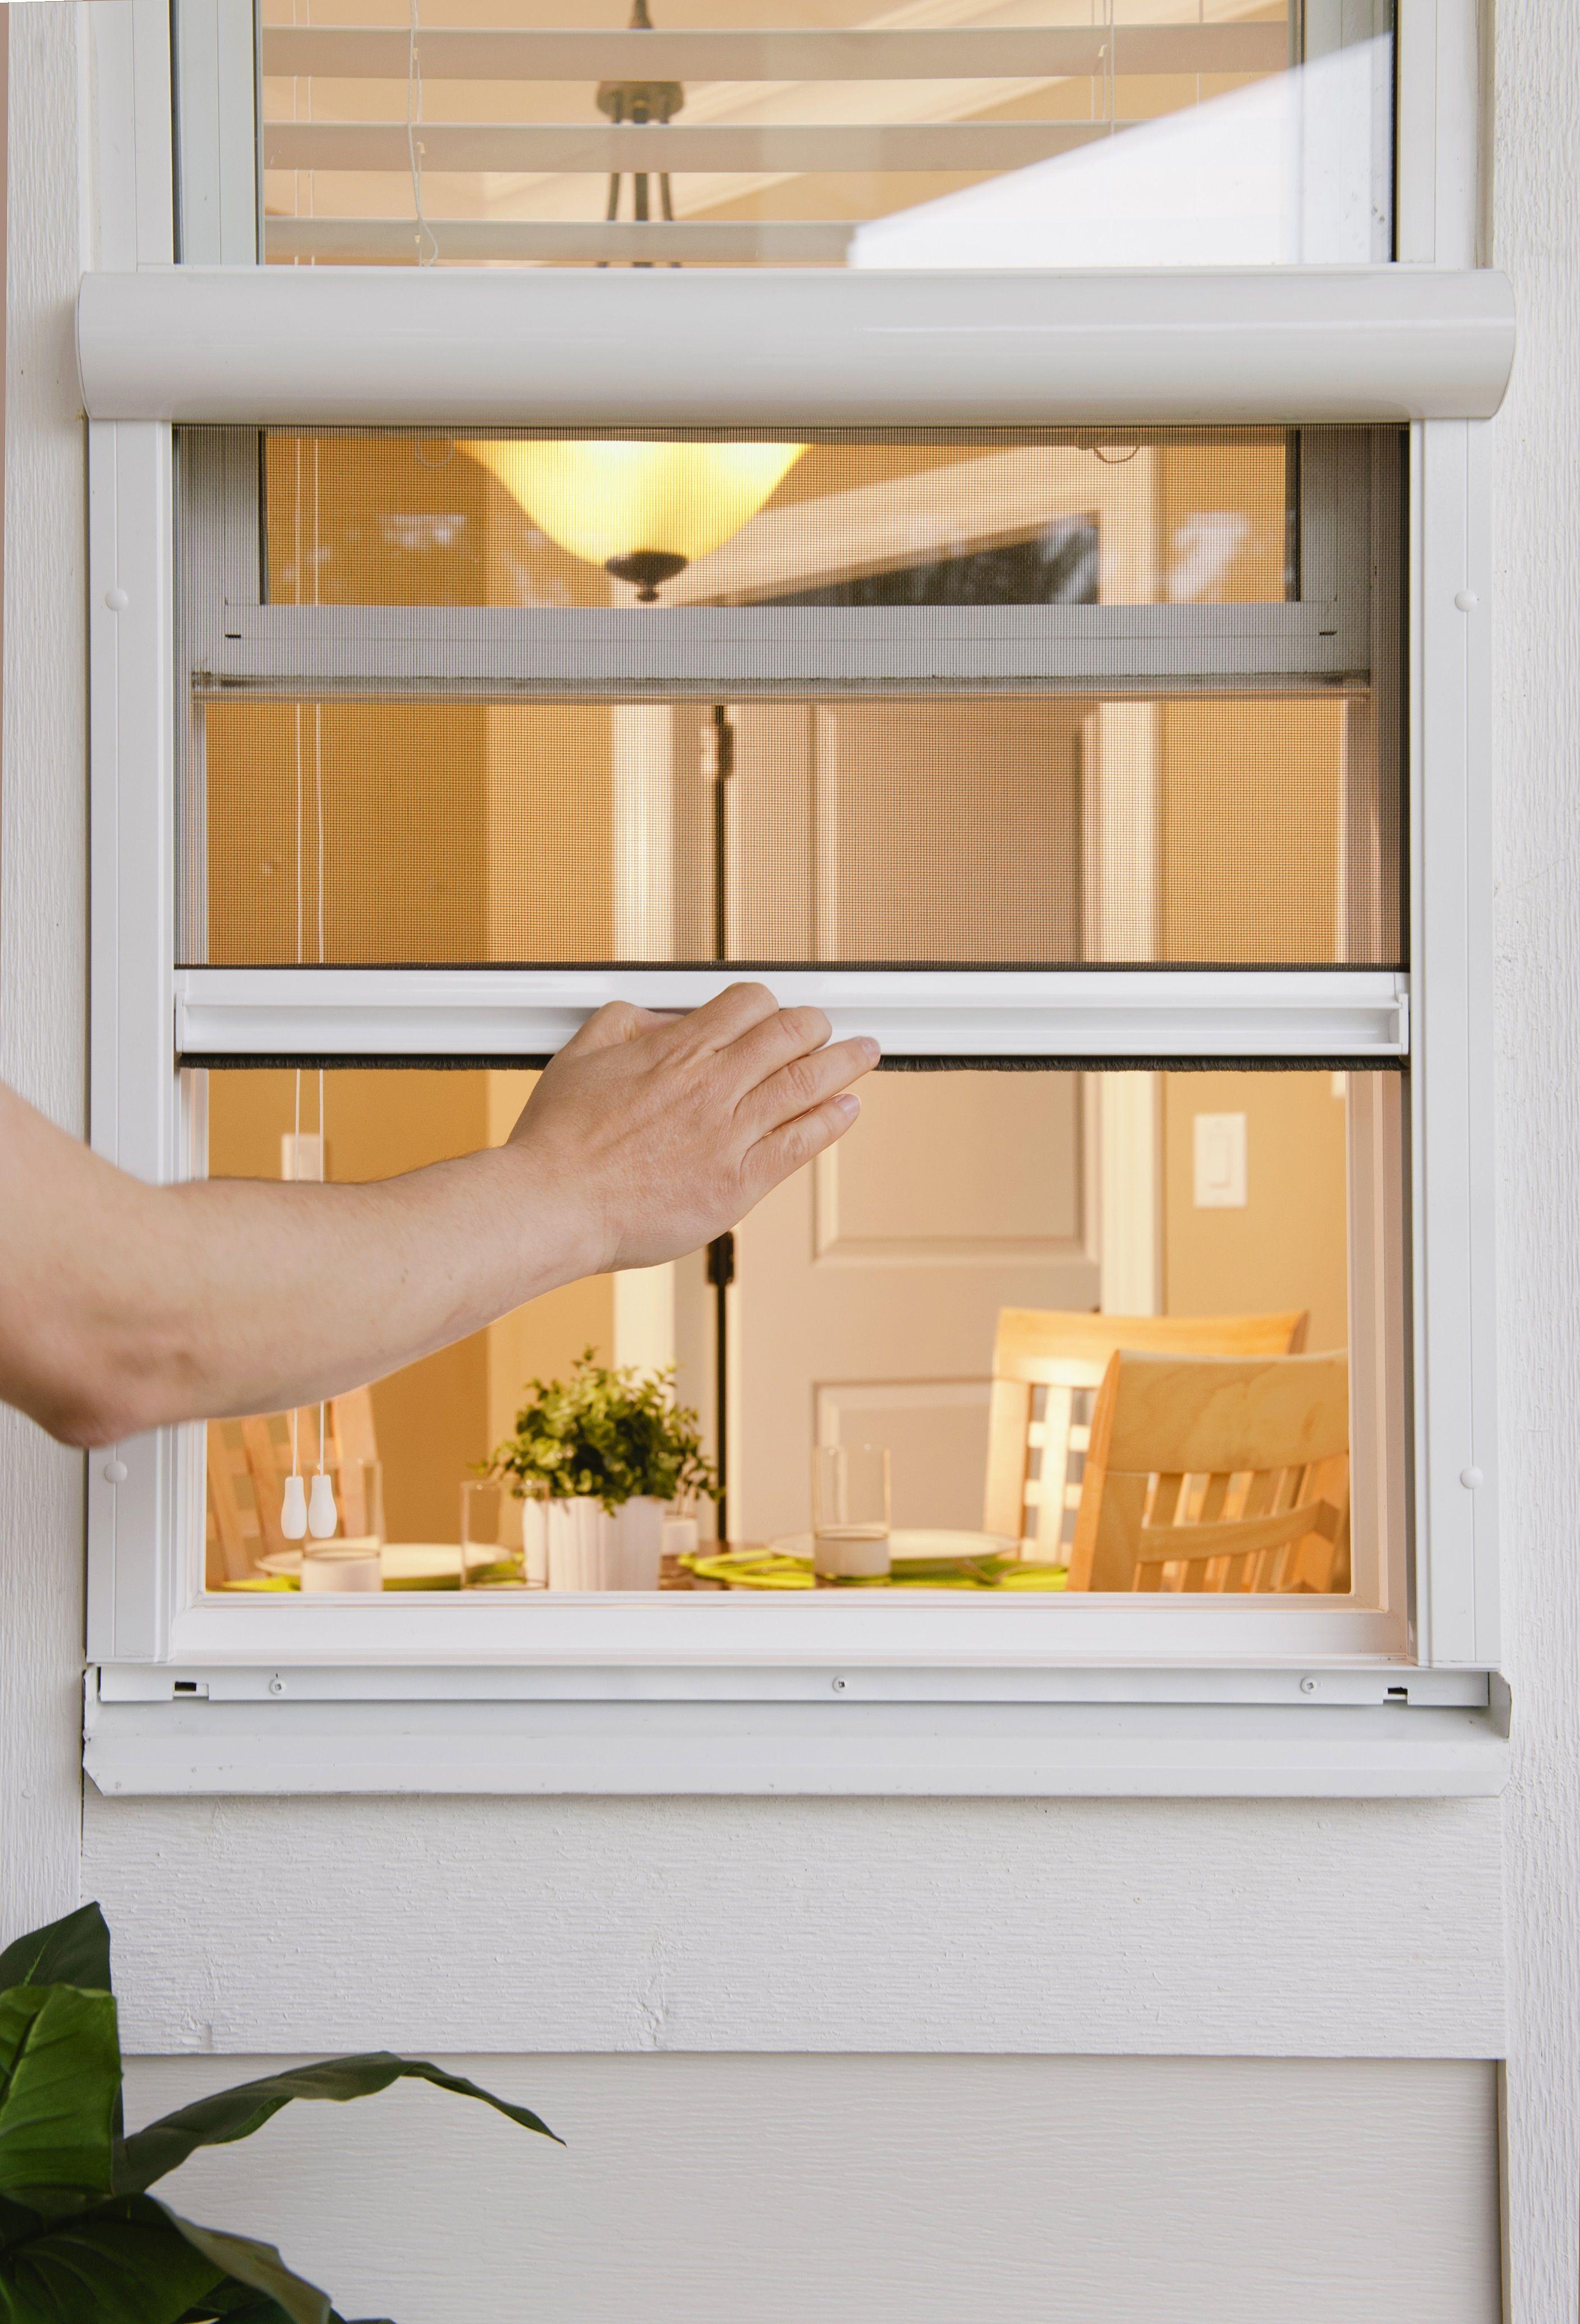 Non Obstructing Window Screens In 2020 Retractable Window Screens Window Screens Phantom Screens